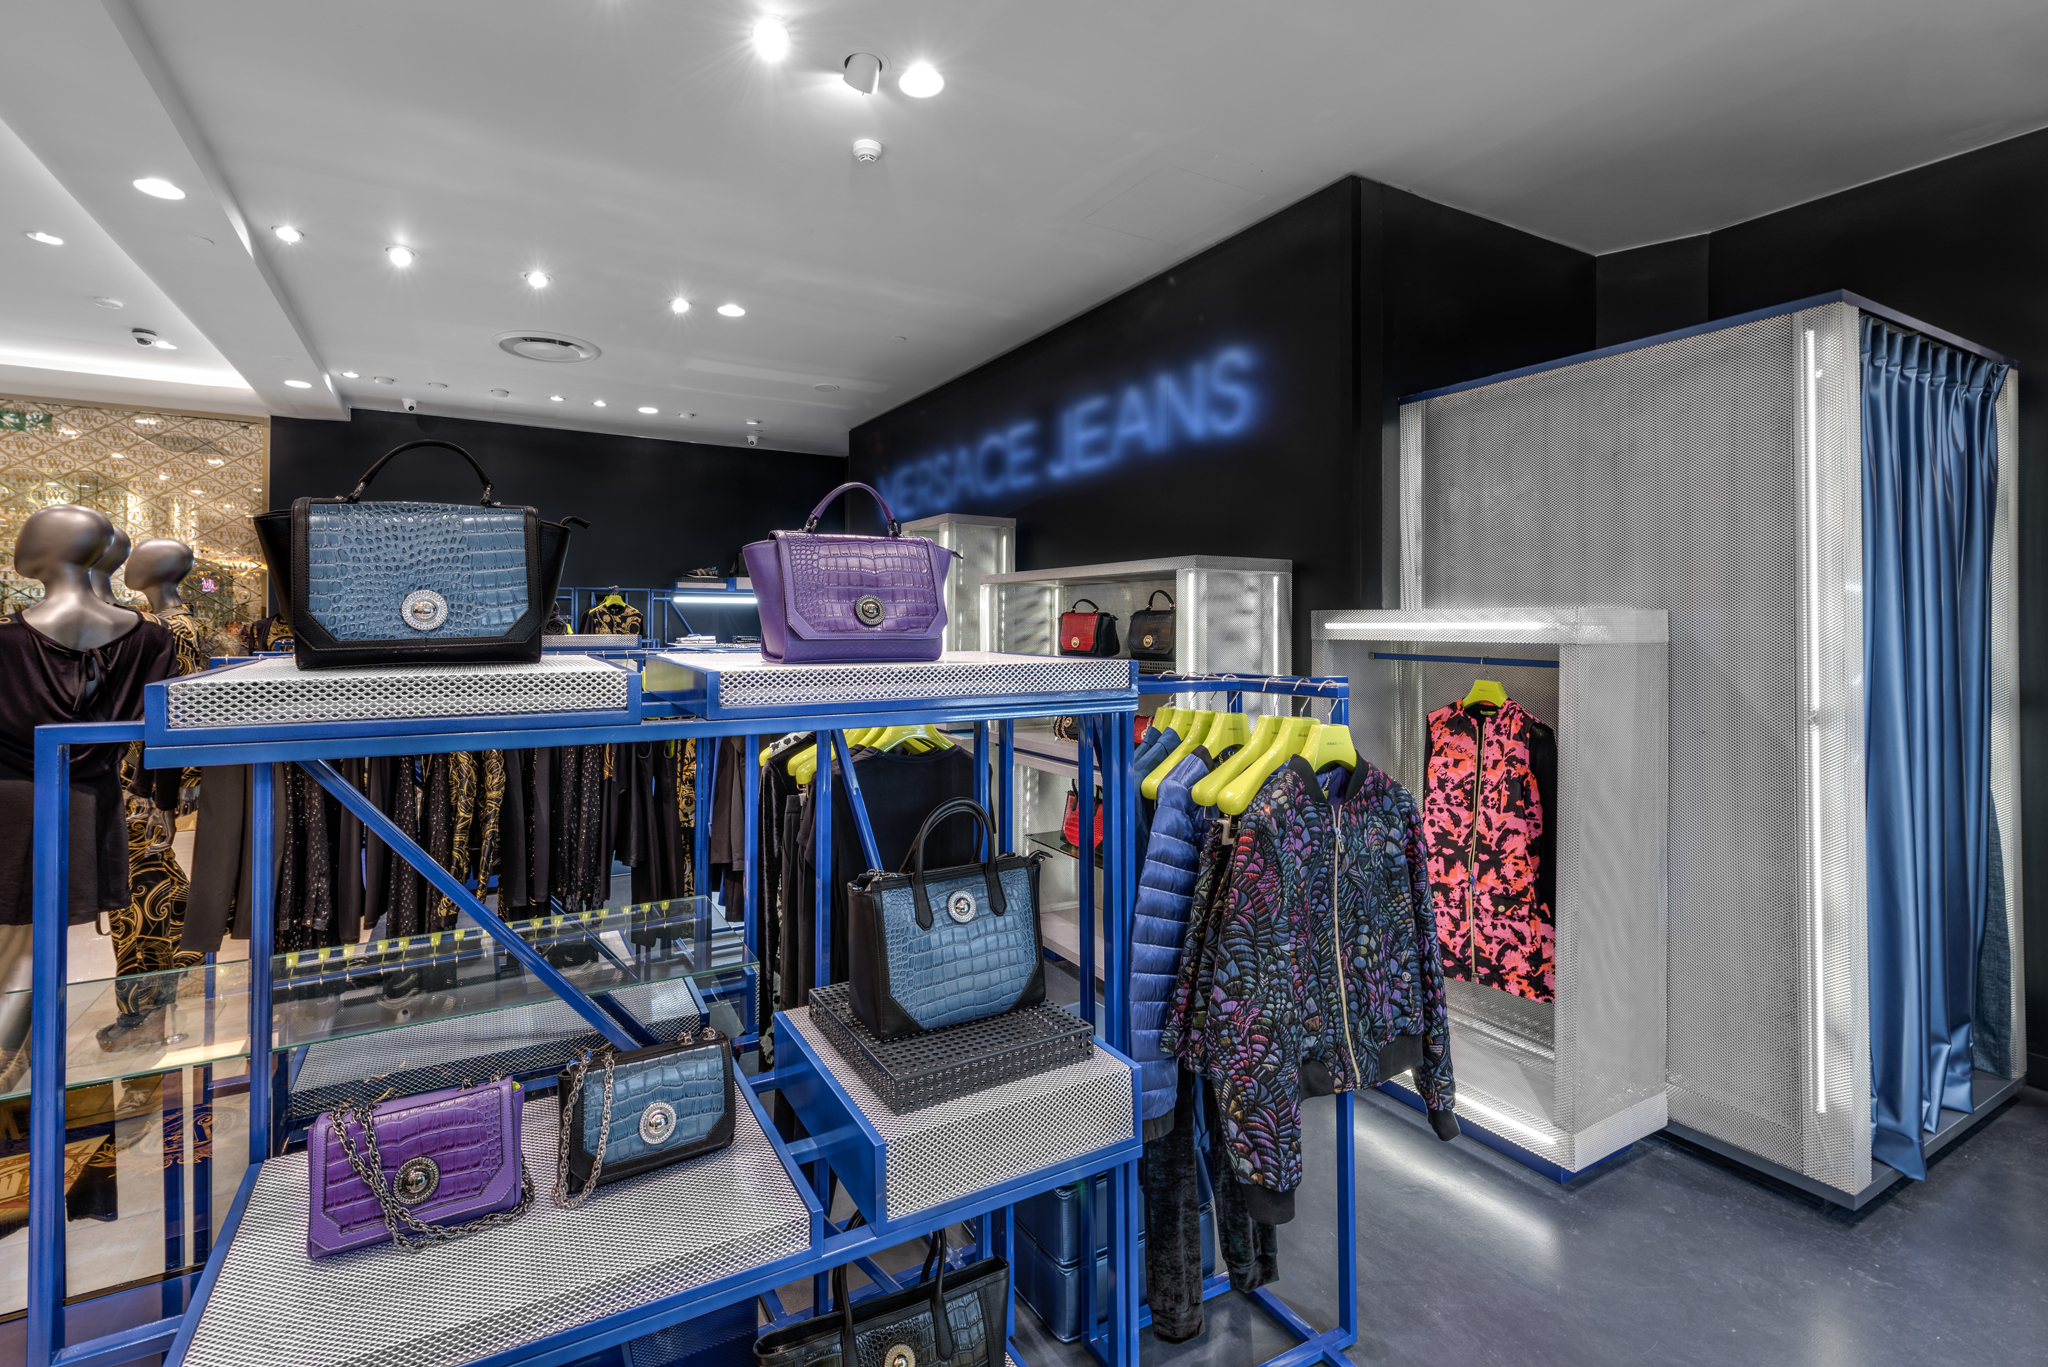 20160729 - Versace Jean - HCM - Commercial - Interior - Store - Retouch 0006.jpg